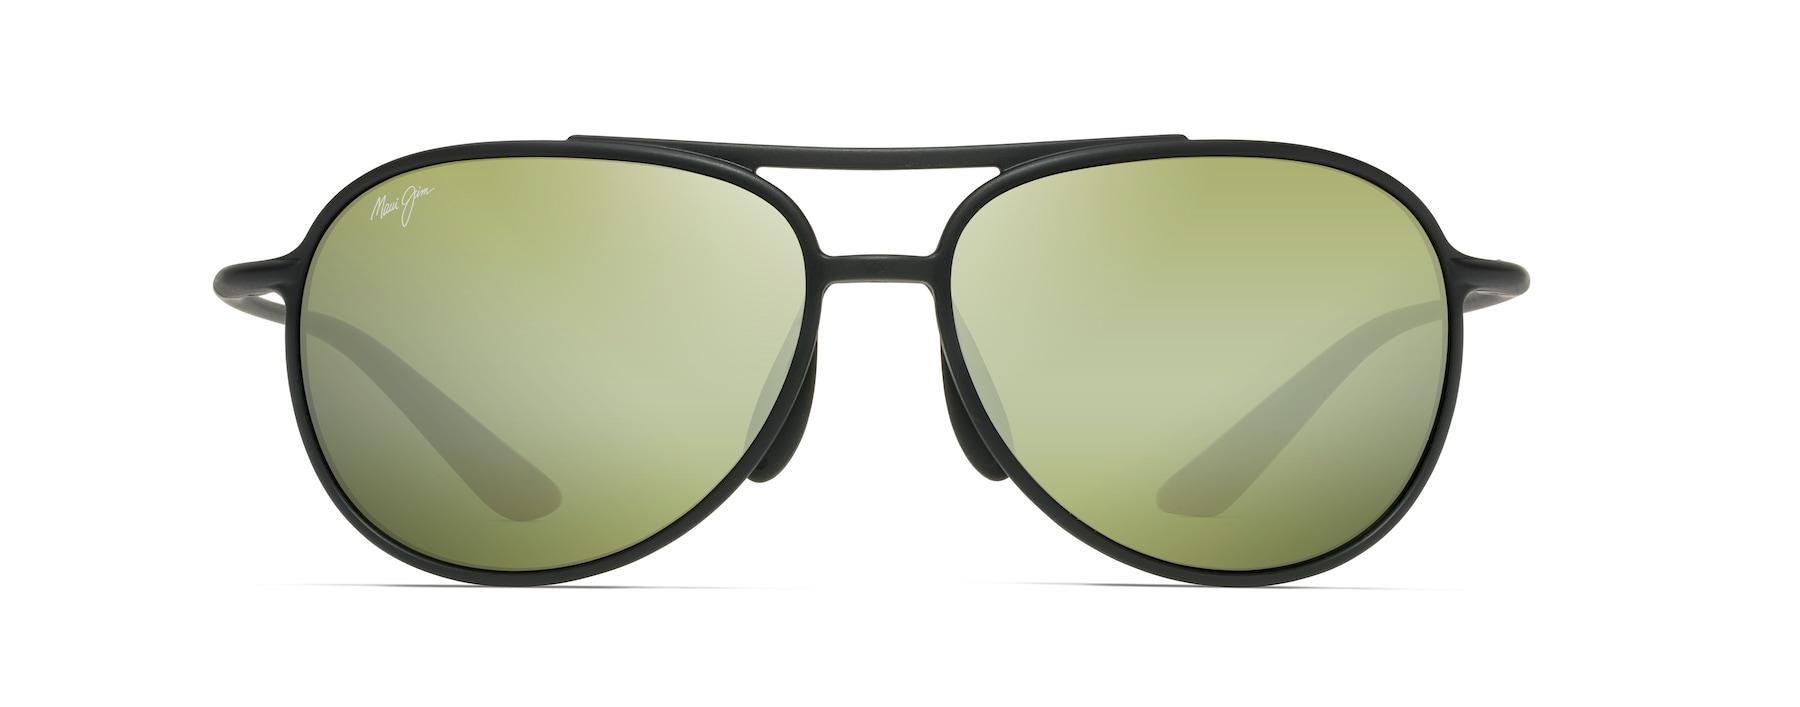 d363b26a9d534 Alelele Bridge Polarized Sunglasses